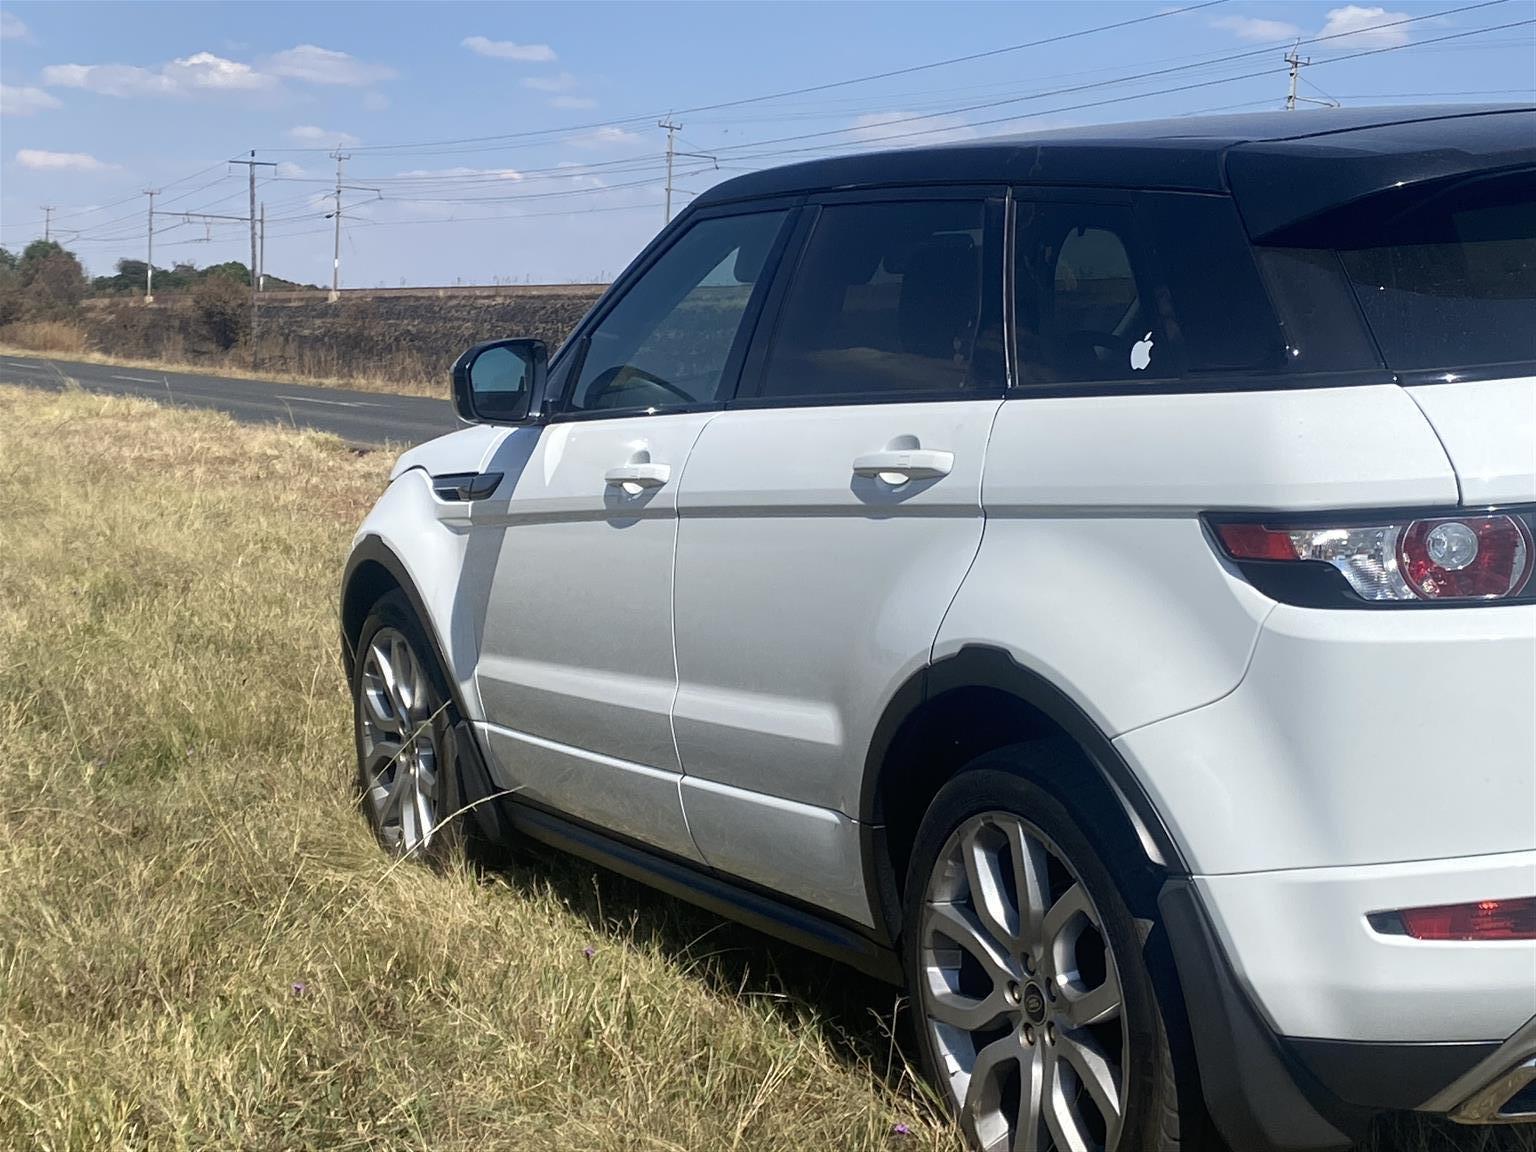 Range Rover Evoque for Sale